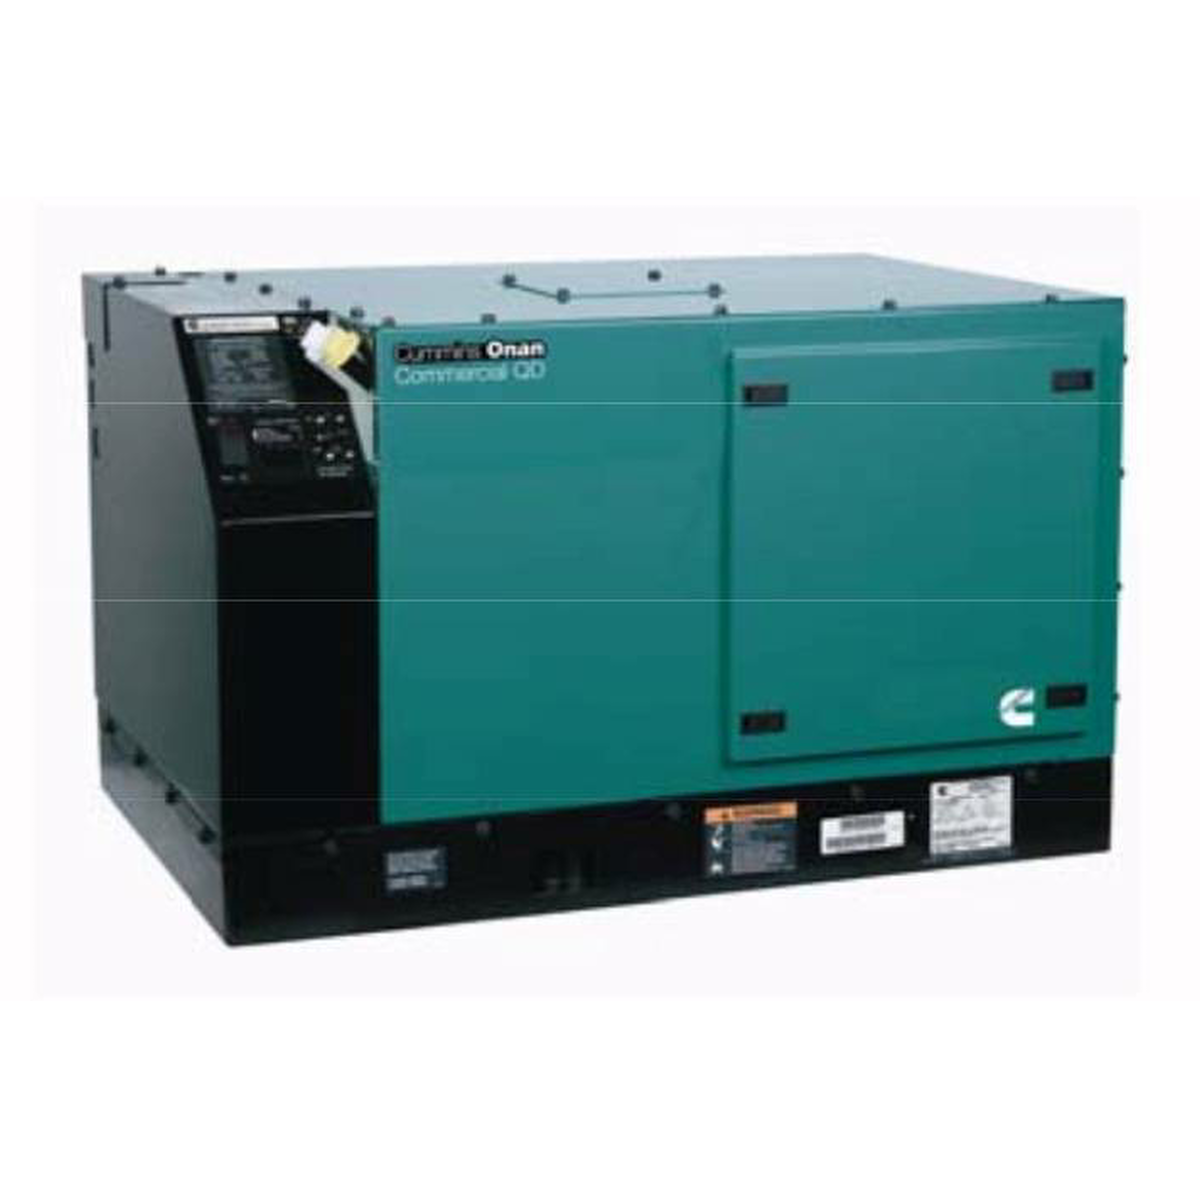 Cummins Onan Commercial Series Qd7500 75kw Diesel Mobile Generator 6 3 Propane Rv Wiring Diagram 120 Volt Only